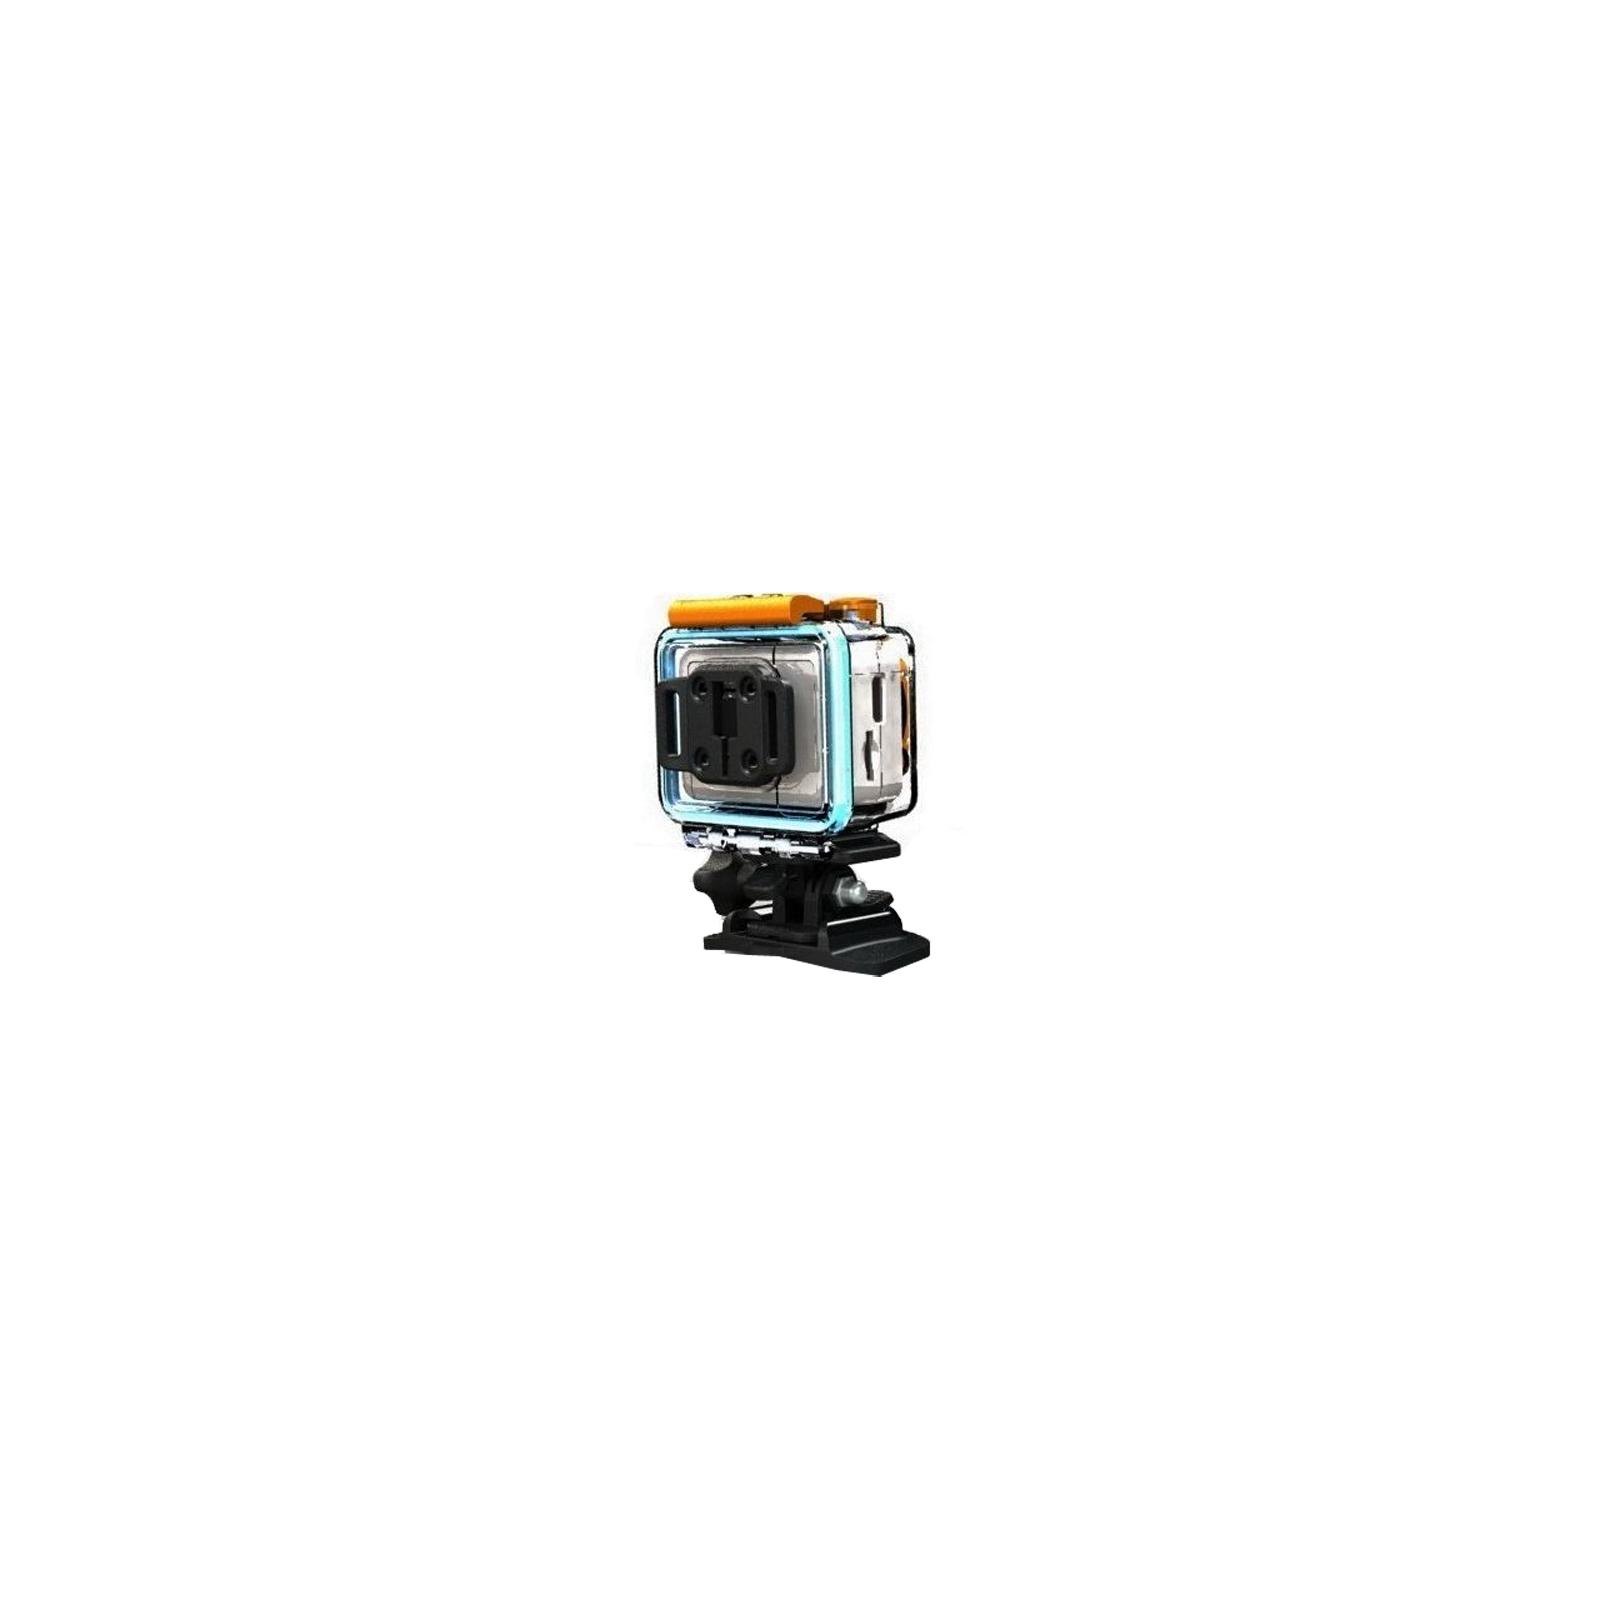 Экшн-камера HP ac200w изображение 2